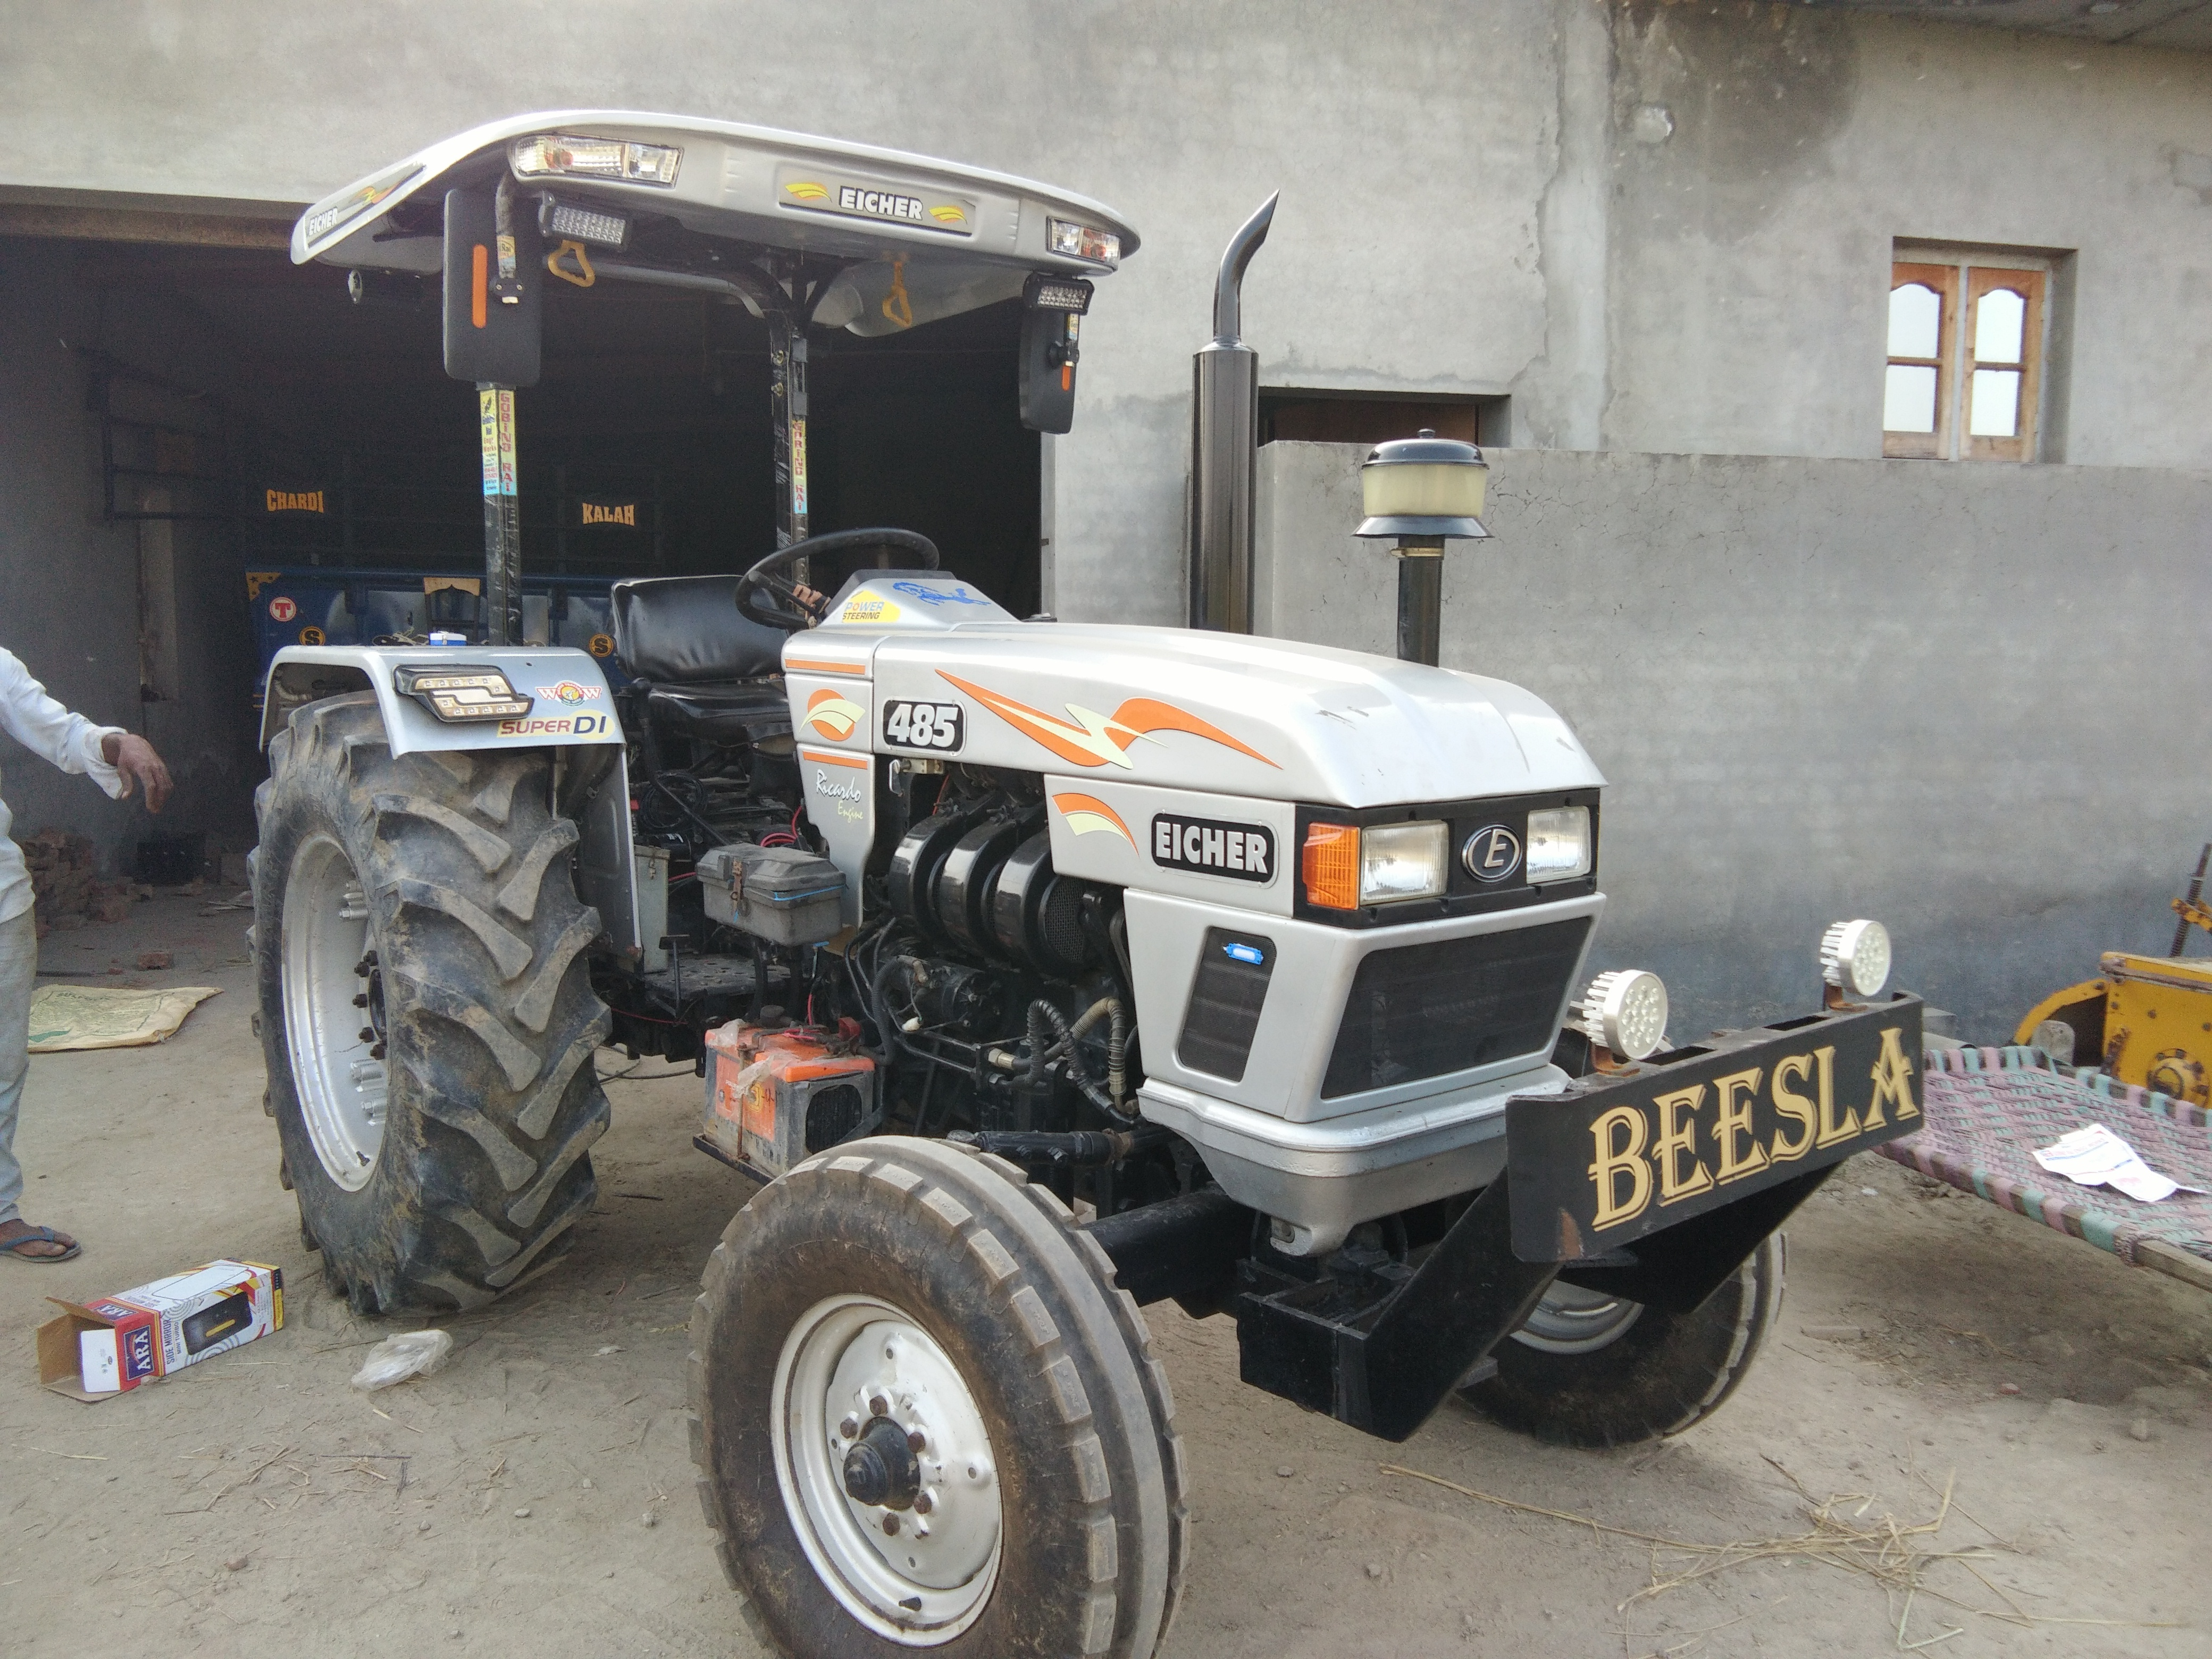 Eicher tractor fibre chattri